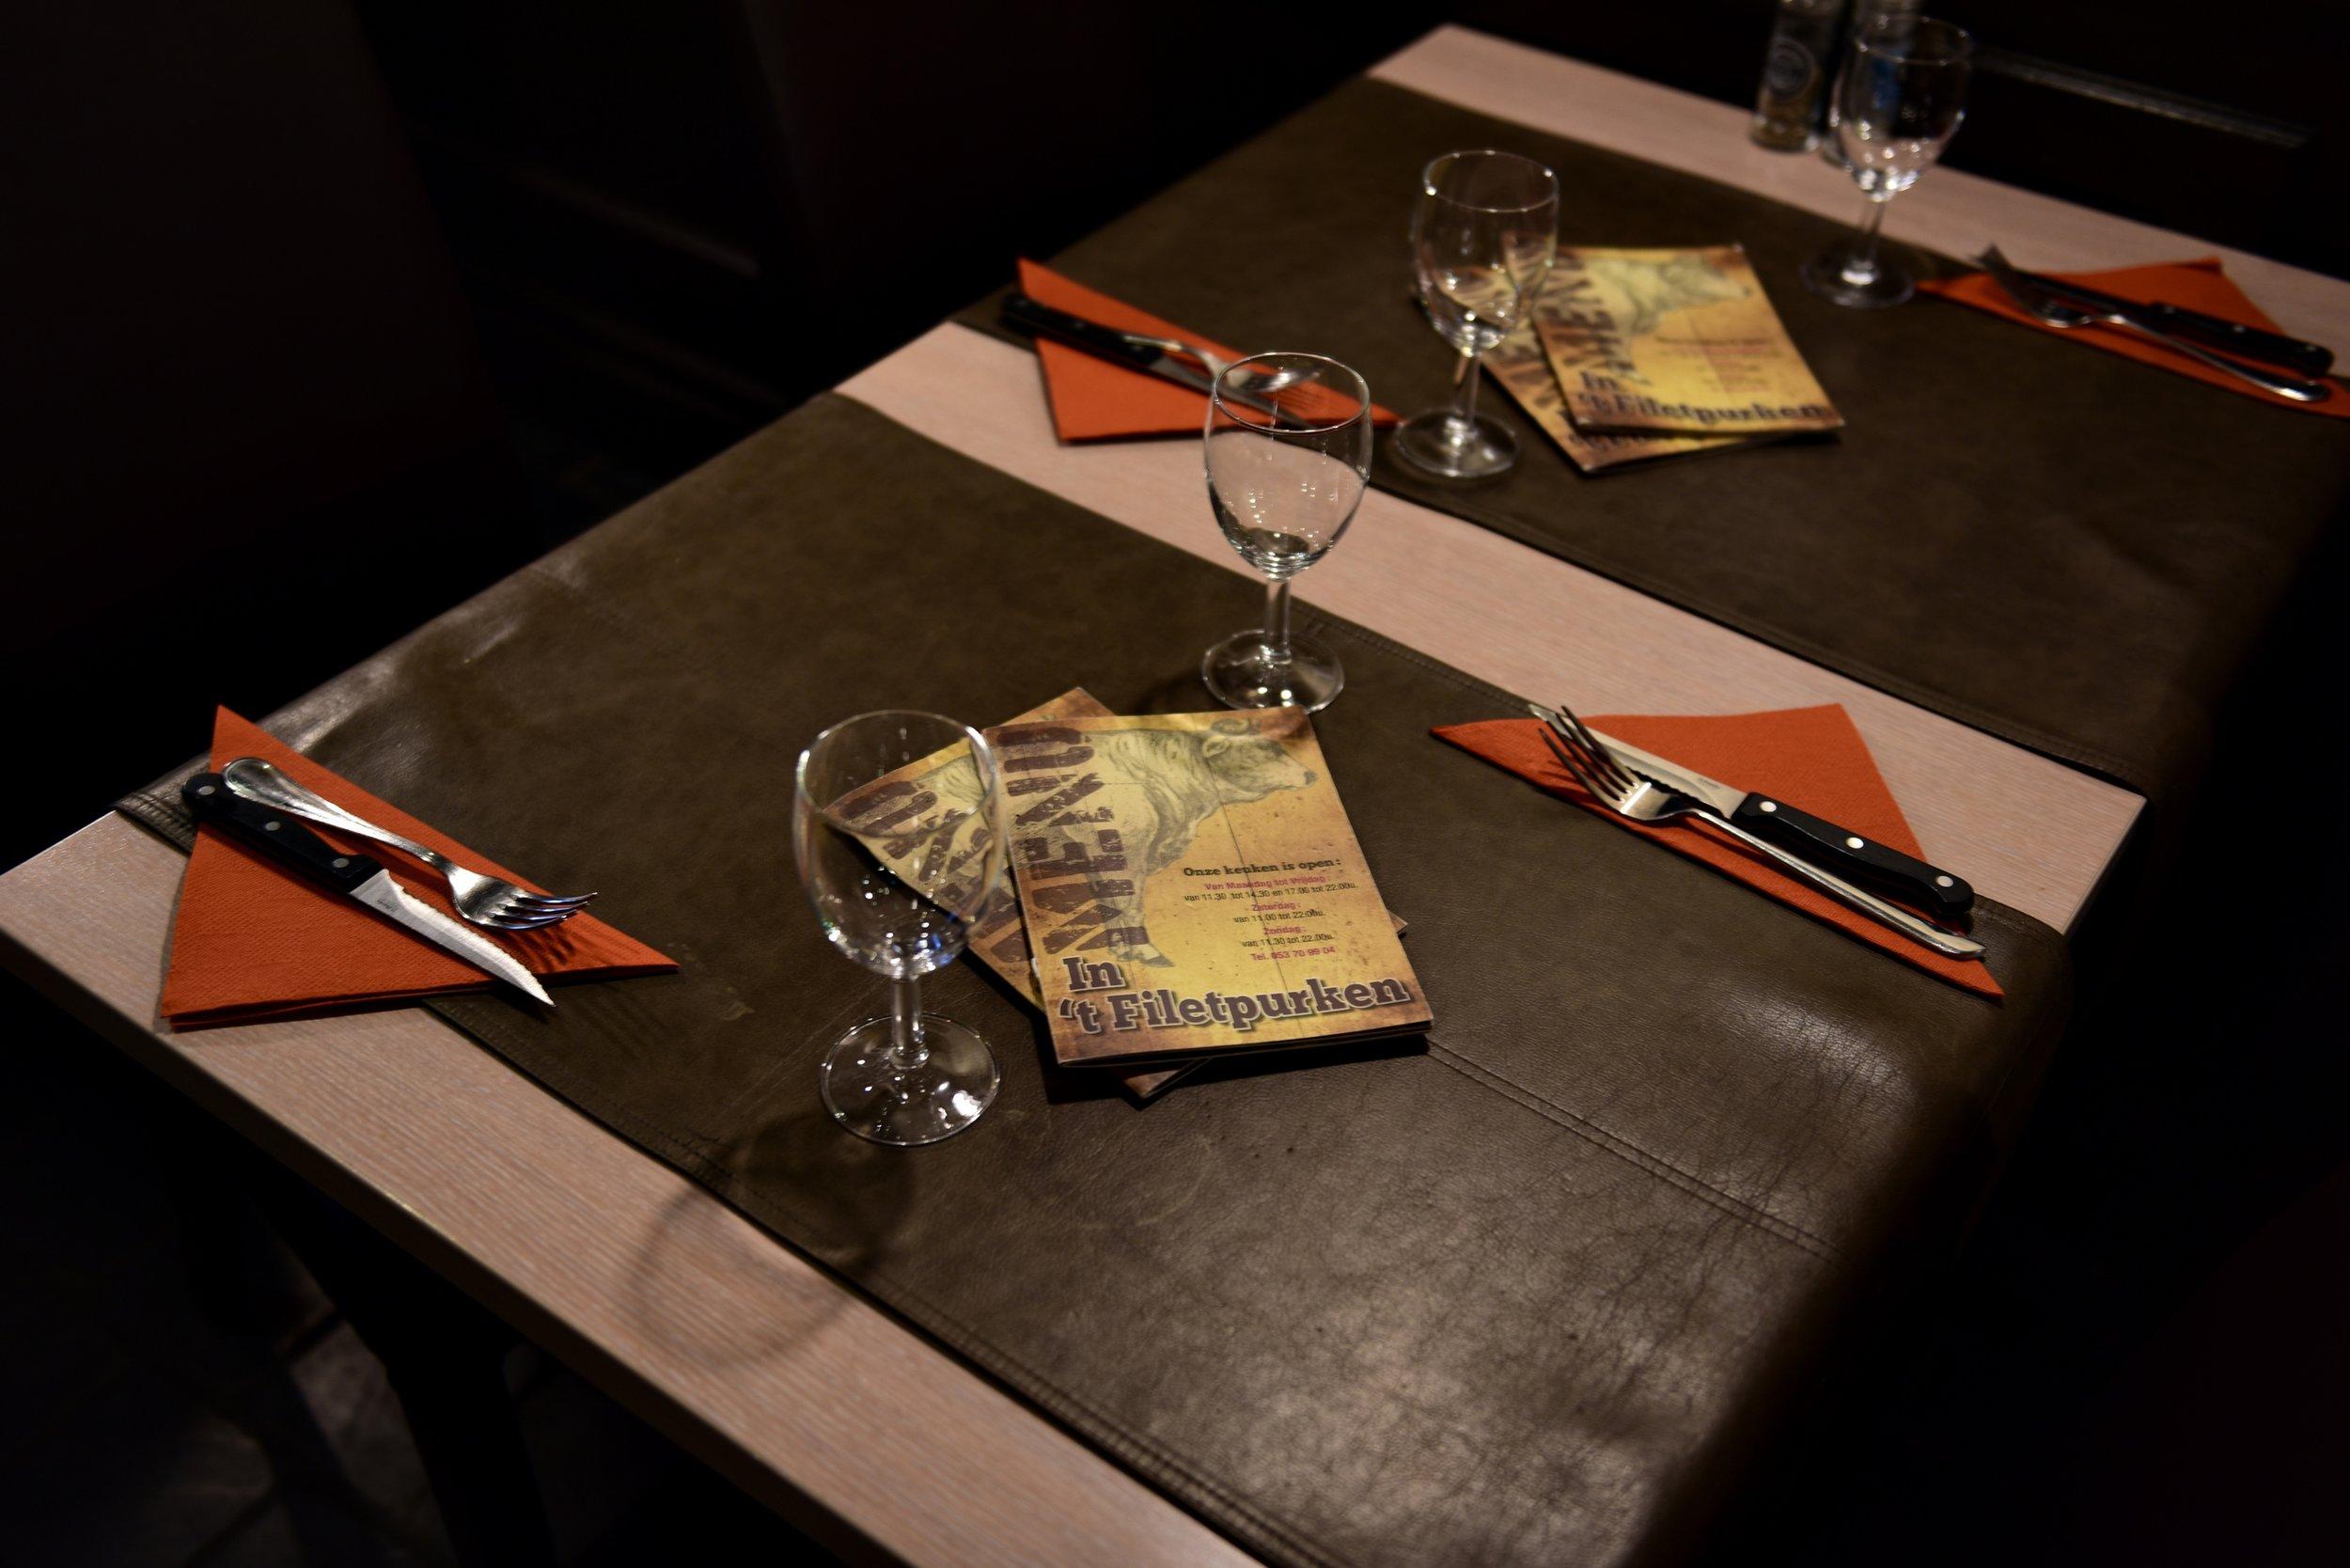 14 restuarant brasserie t filet purreke pureke aalst steak pur tablefever .jpg